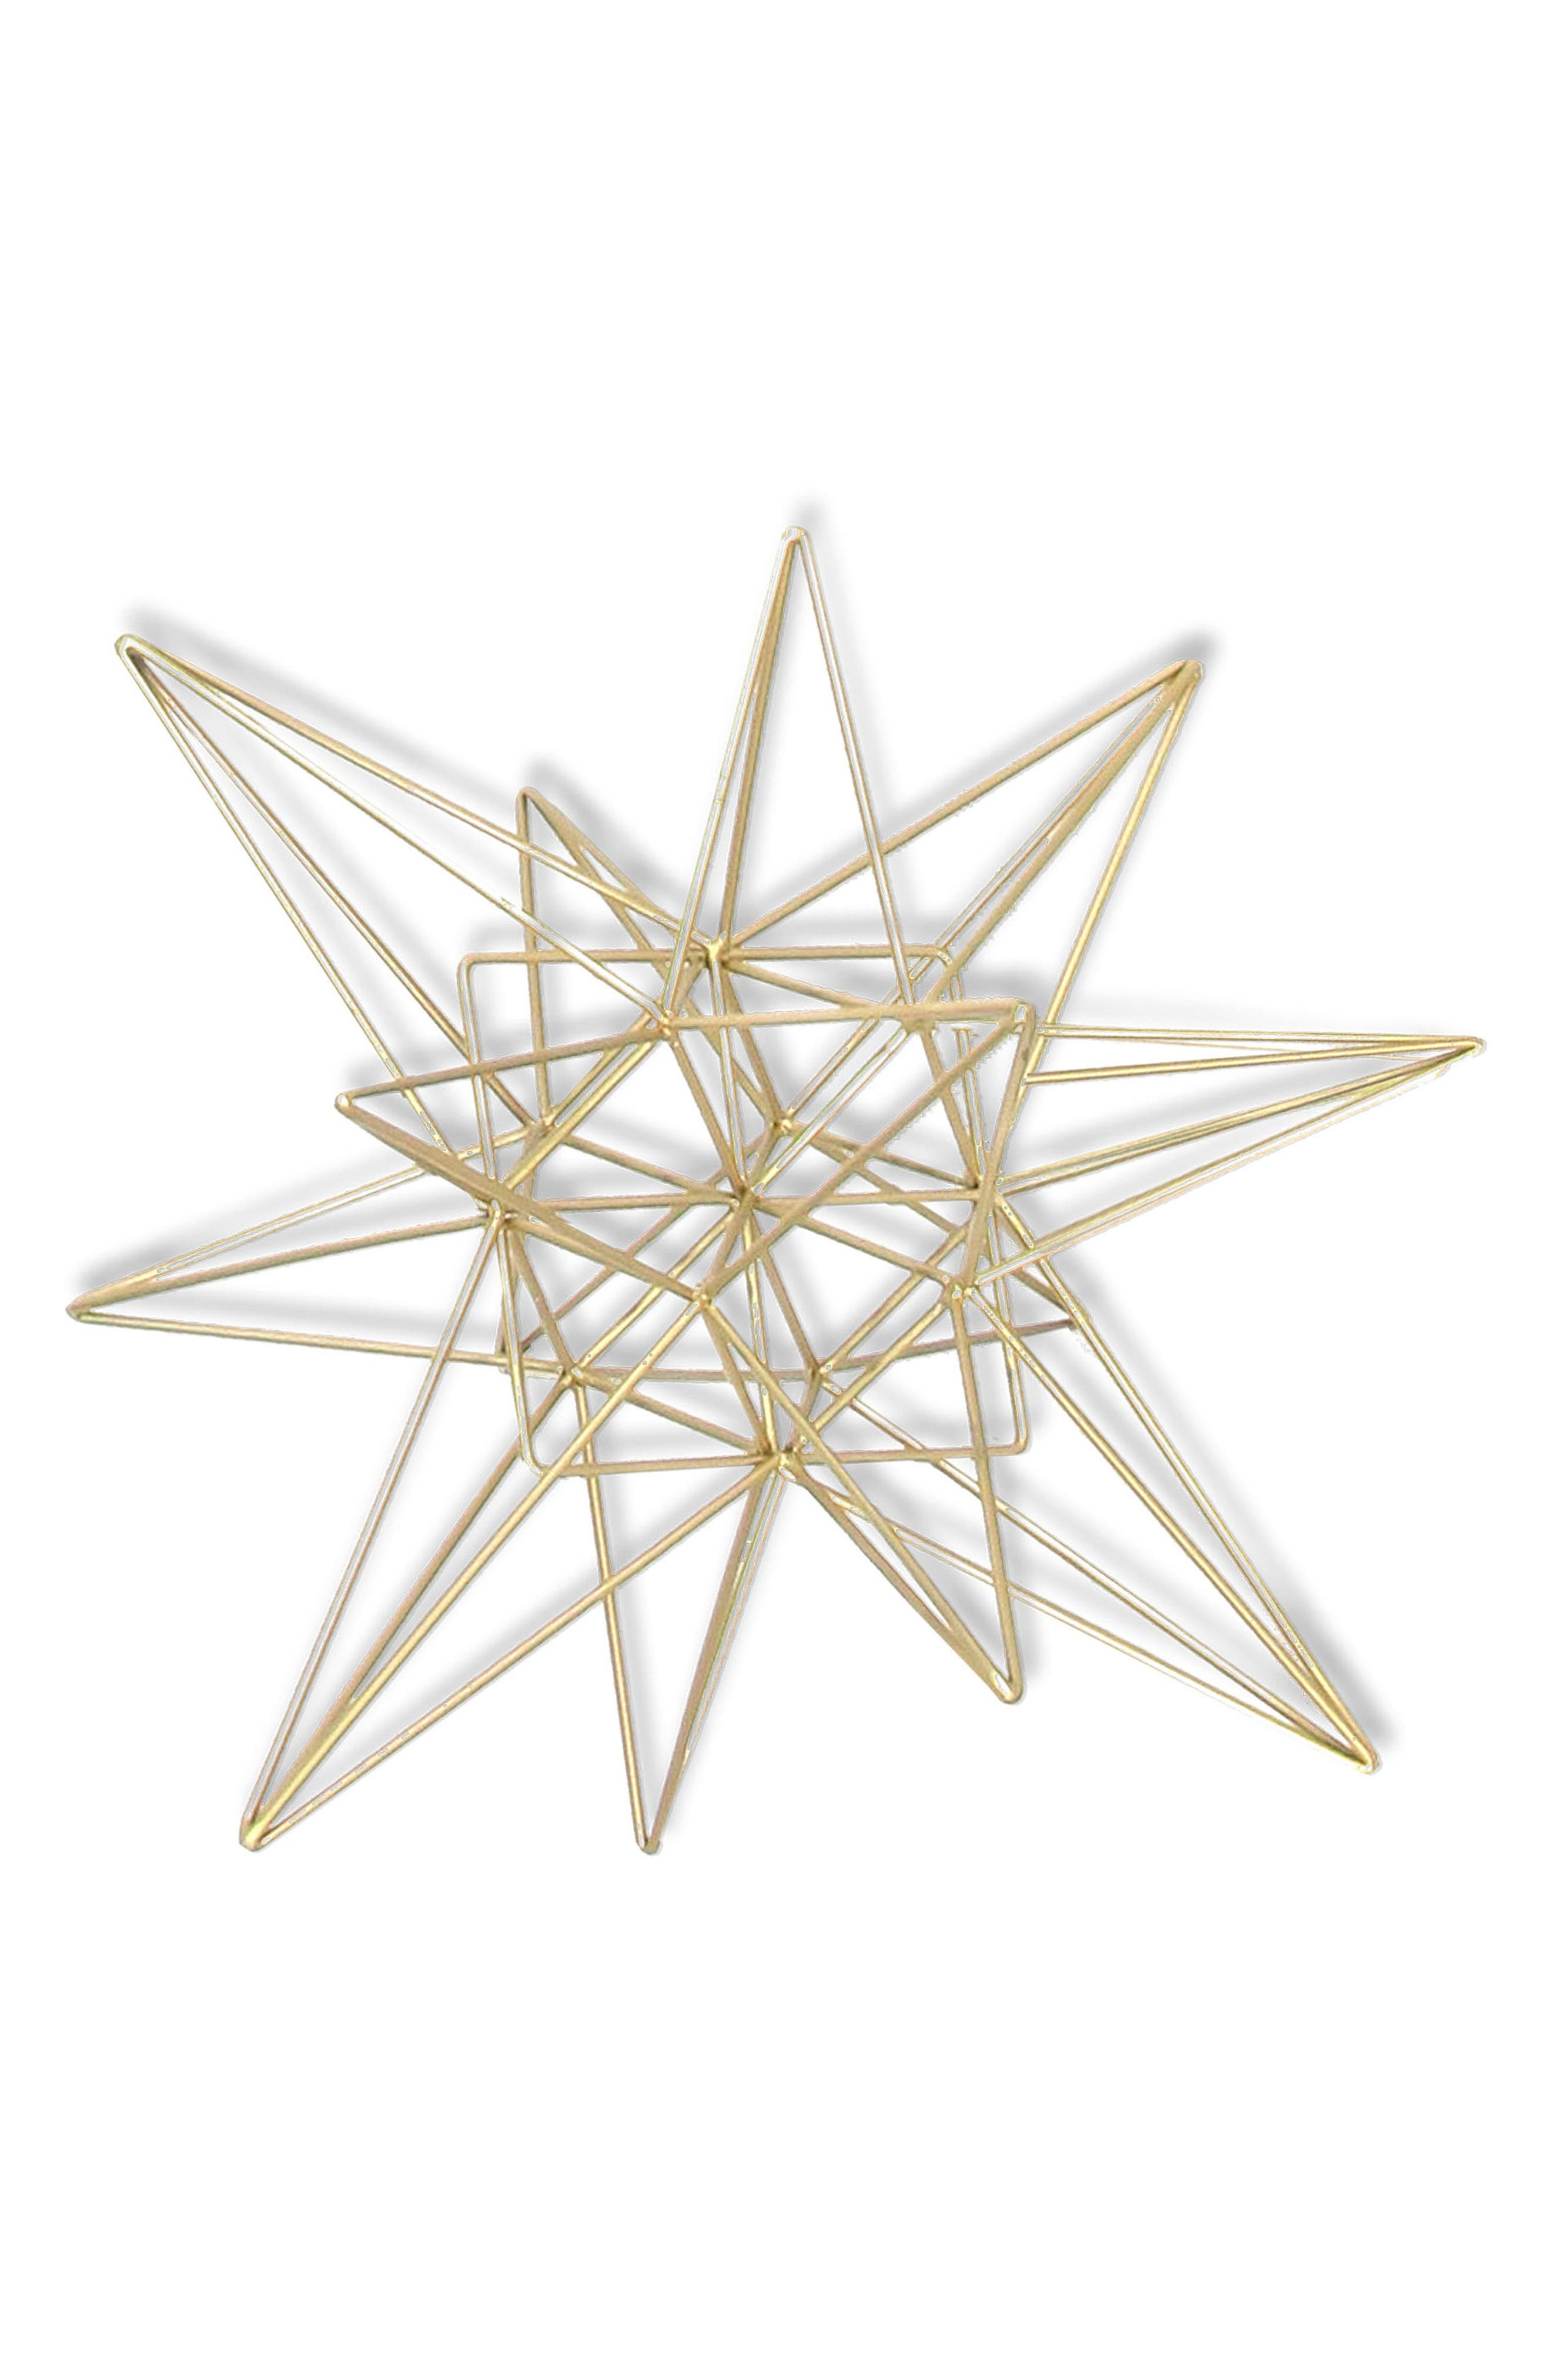 Crystal Art Gallery 3D Star Goldtone Tabletop Decoration